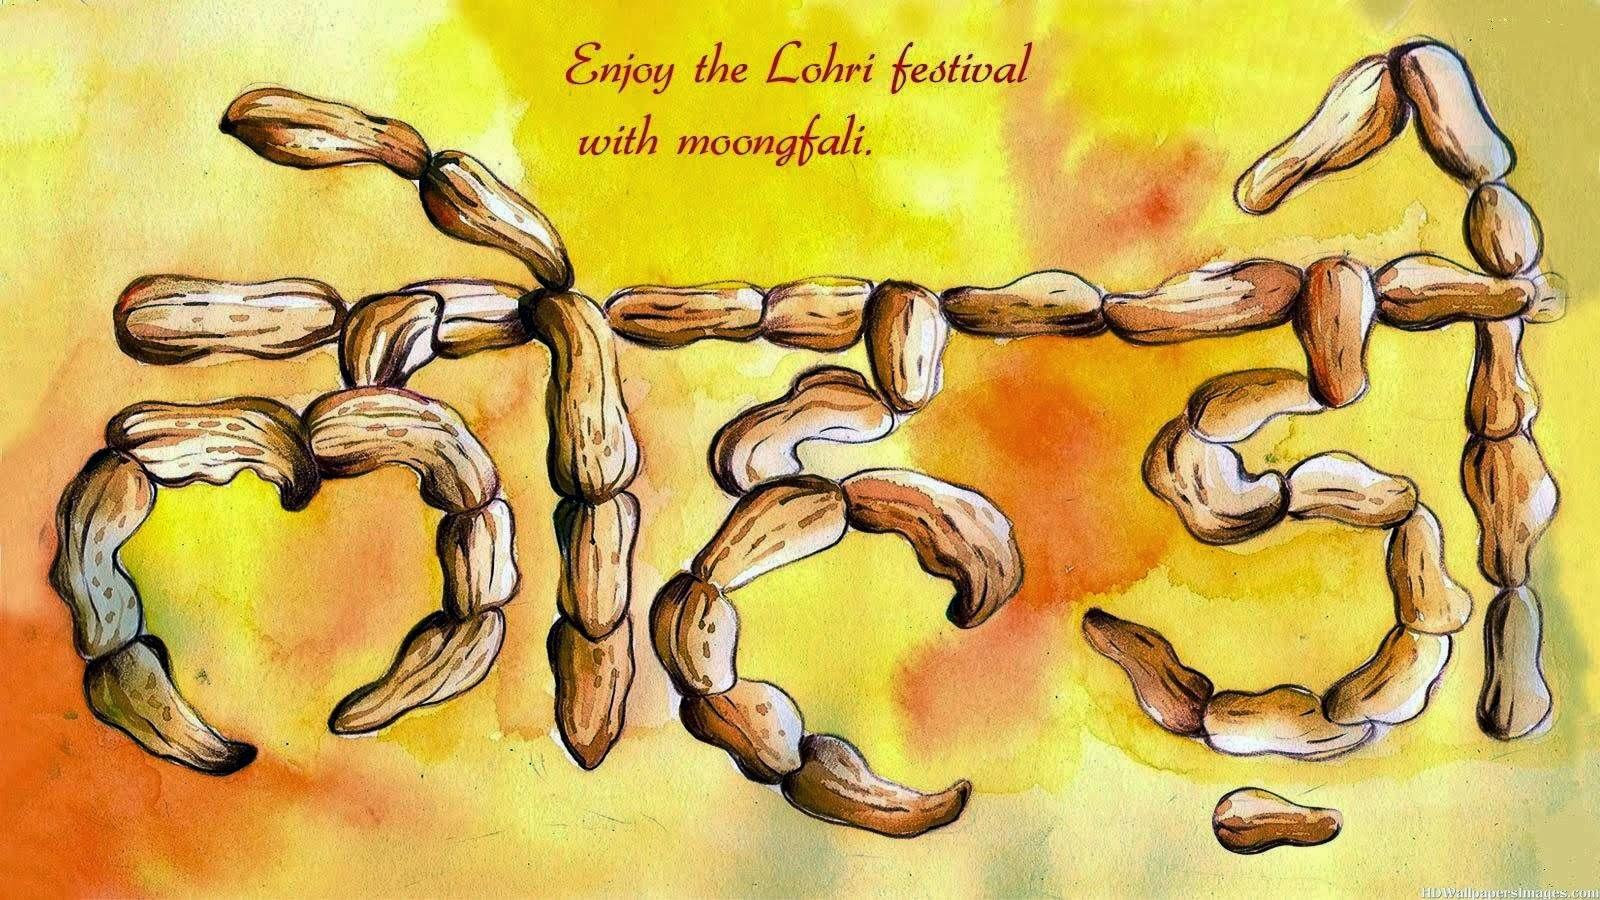 Happy lohri festival hindi shayari punjabi wishes quotes sms happy lohri festival hindi shayari punjabi wishes quotes sms english message m4hsunfo Image collections